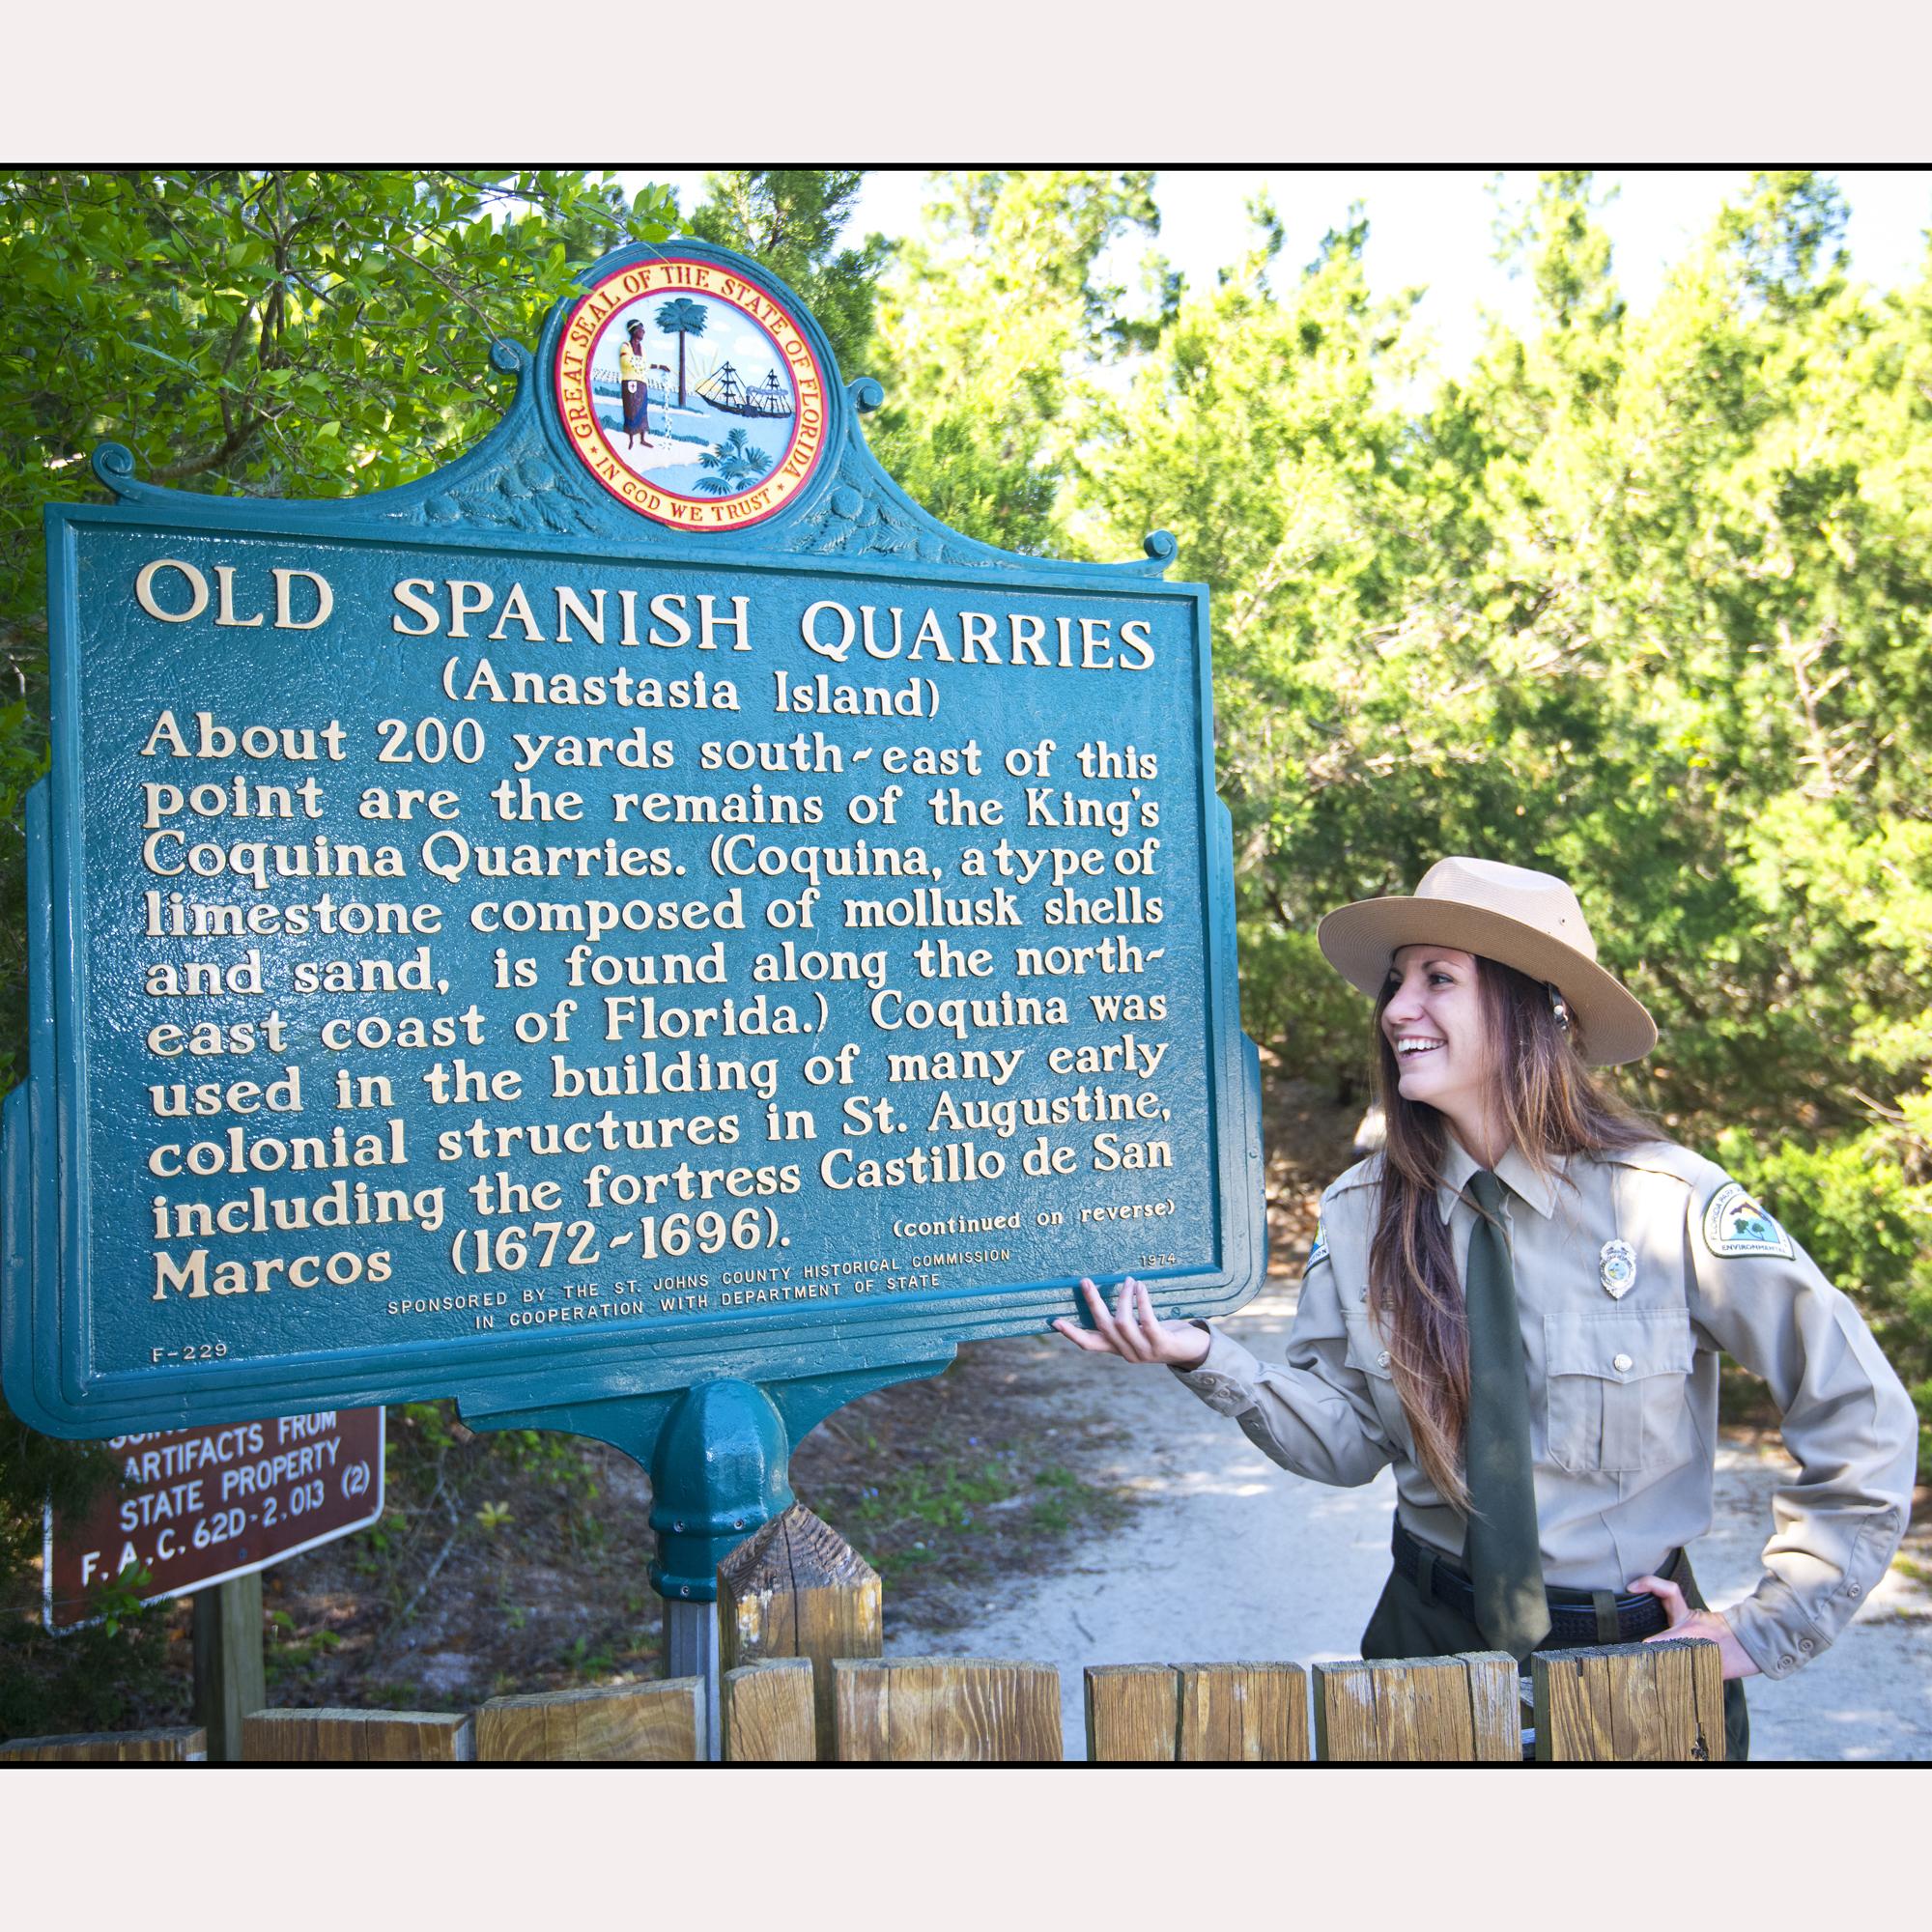 Old Spanish Quarries Anastasia Island 2000